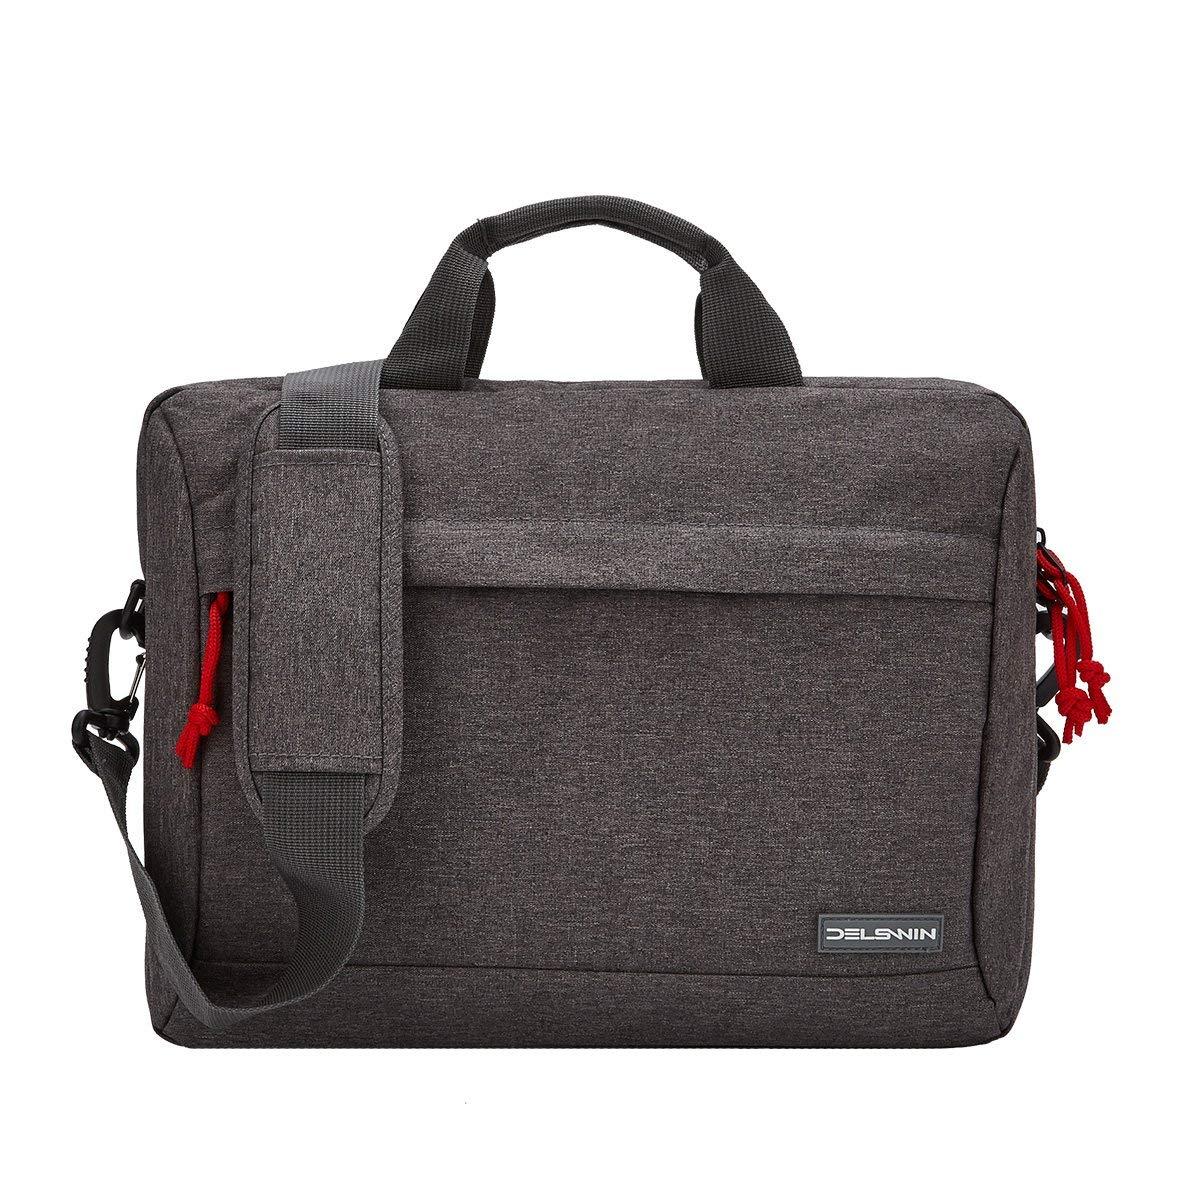 DELSWIN 14 Inches Laptop Briefcase Sleeve - Lightweight Laptop Shoulder Messenger Bag Business Carrying Handbag for School/Travel/Women/Men (14.1, Gray)